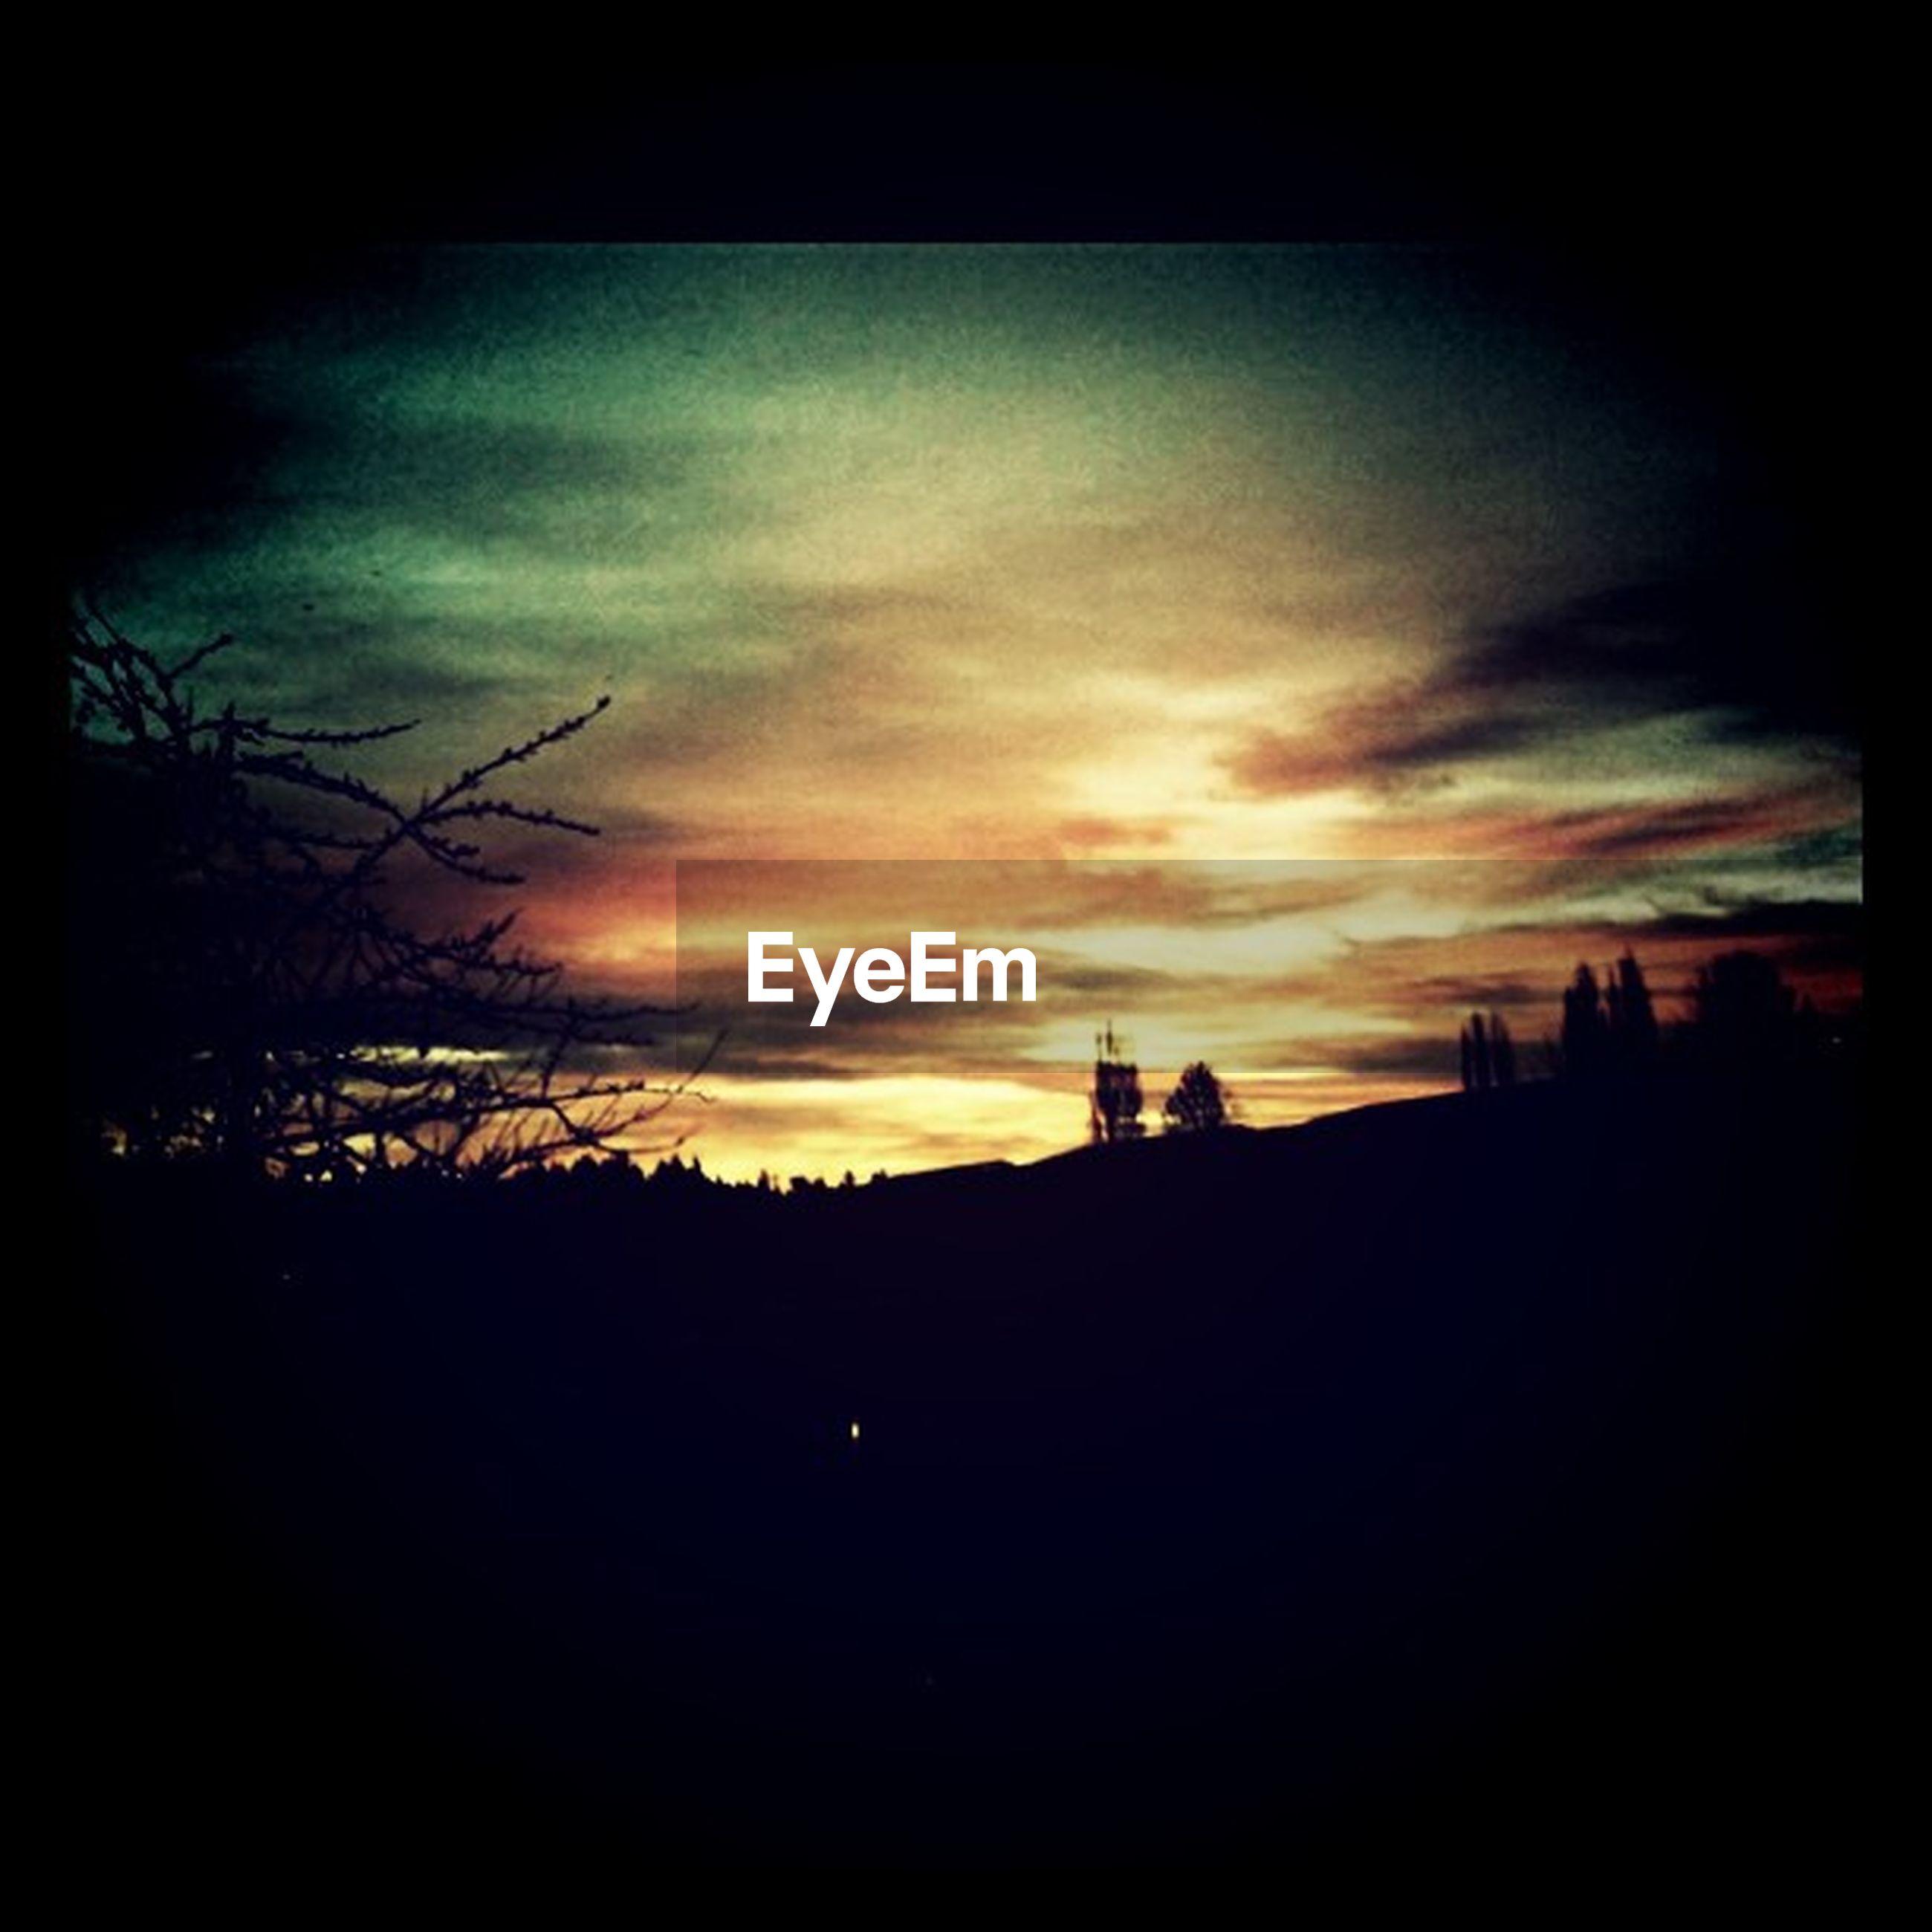 silhouette, sunset, sky, dark, built structure, architecture, tree, scenics, building exterior, cloud - sky, beauty in nature, orange color, tranquility, nature, tranquil scene, outline, dusk, cloud, landscape, dramatic sky